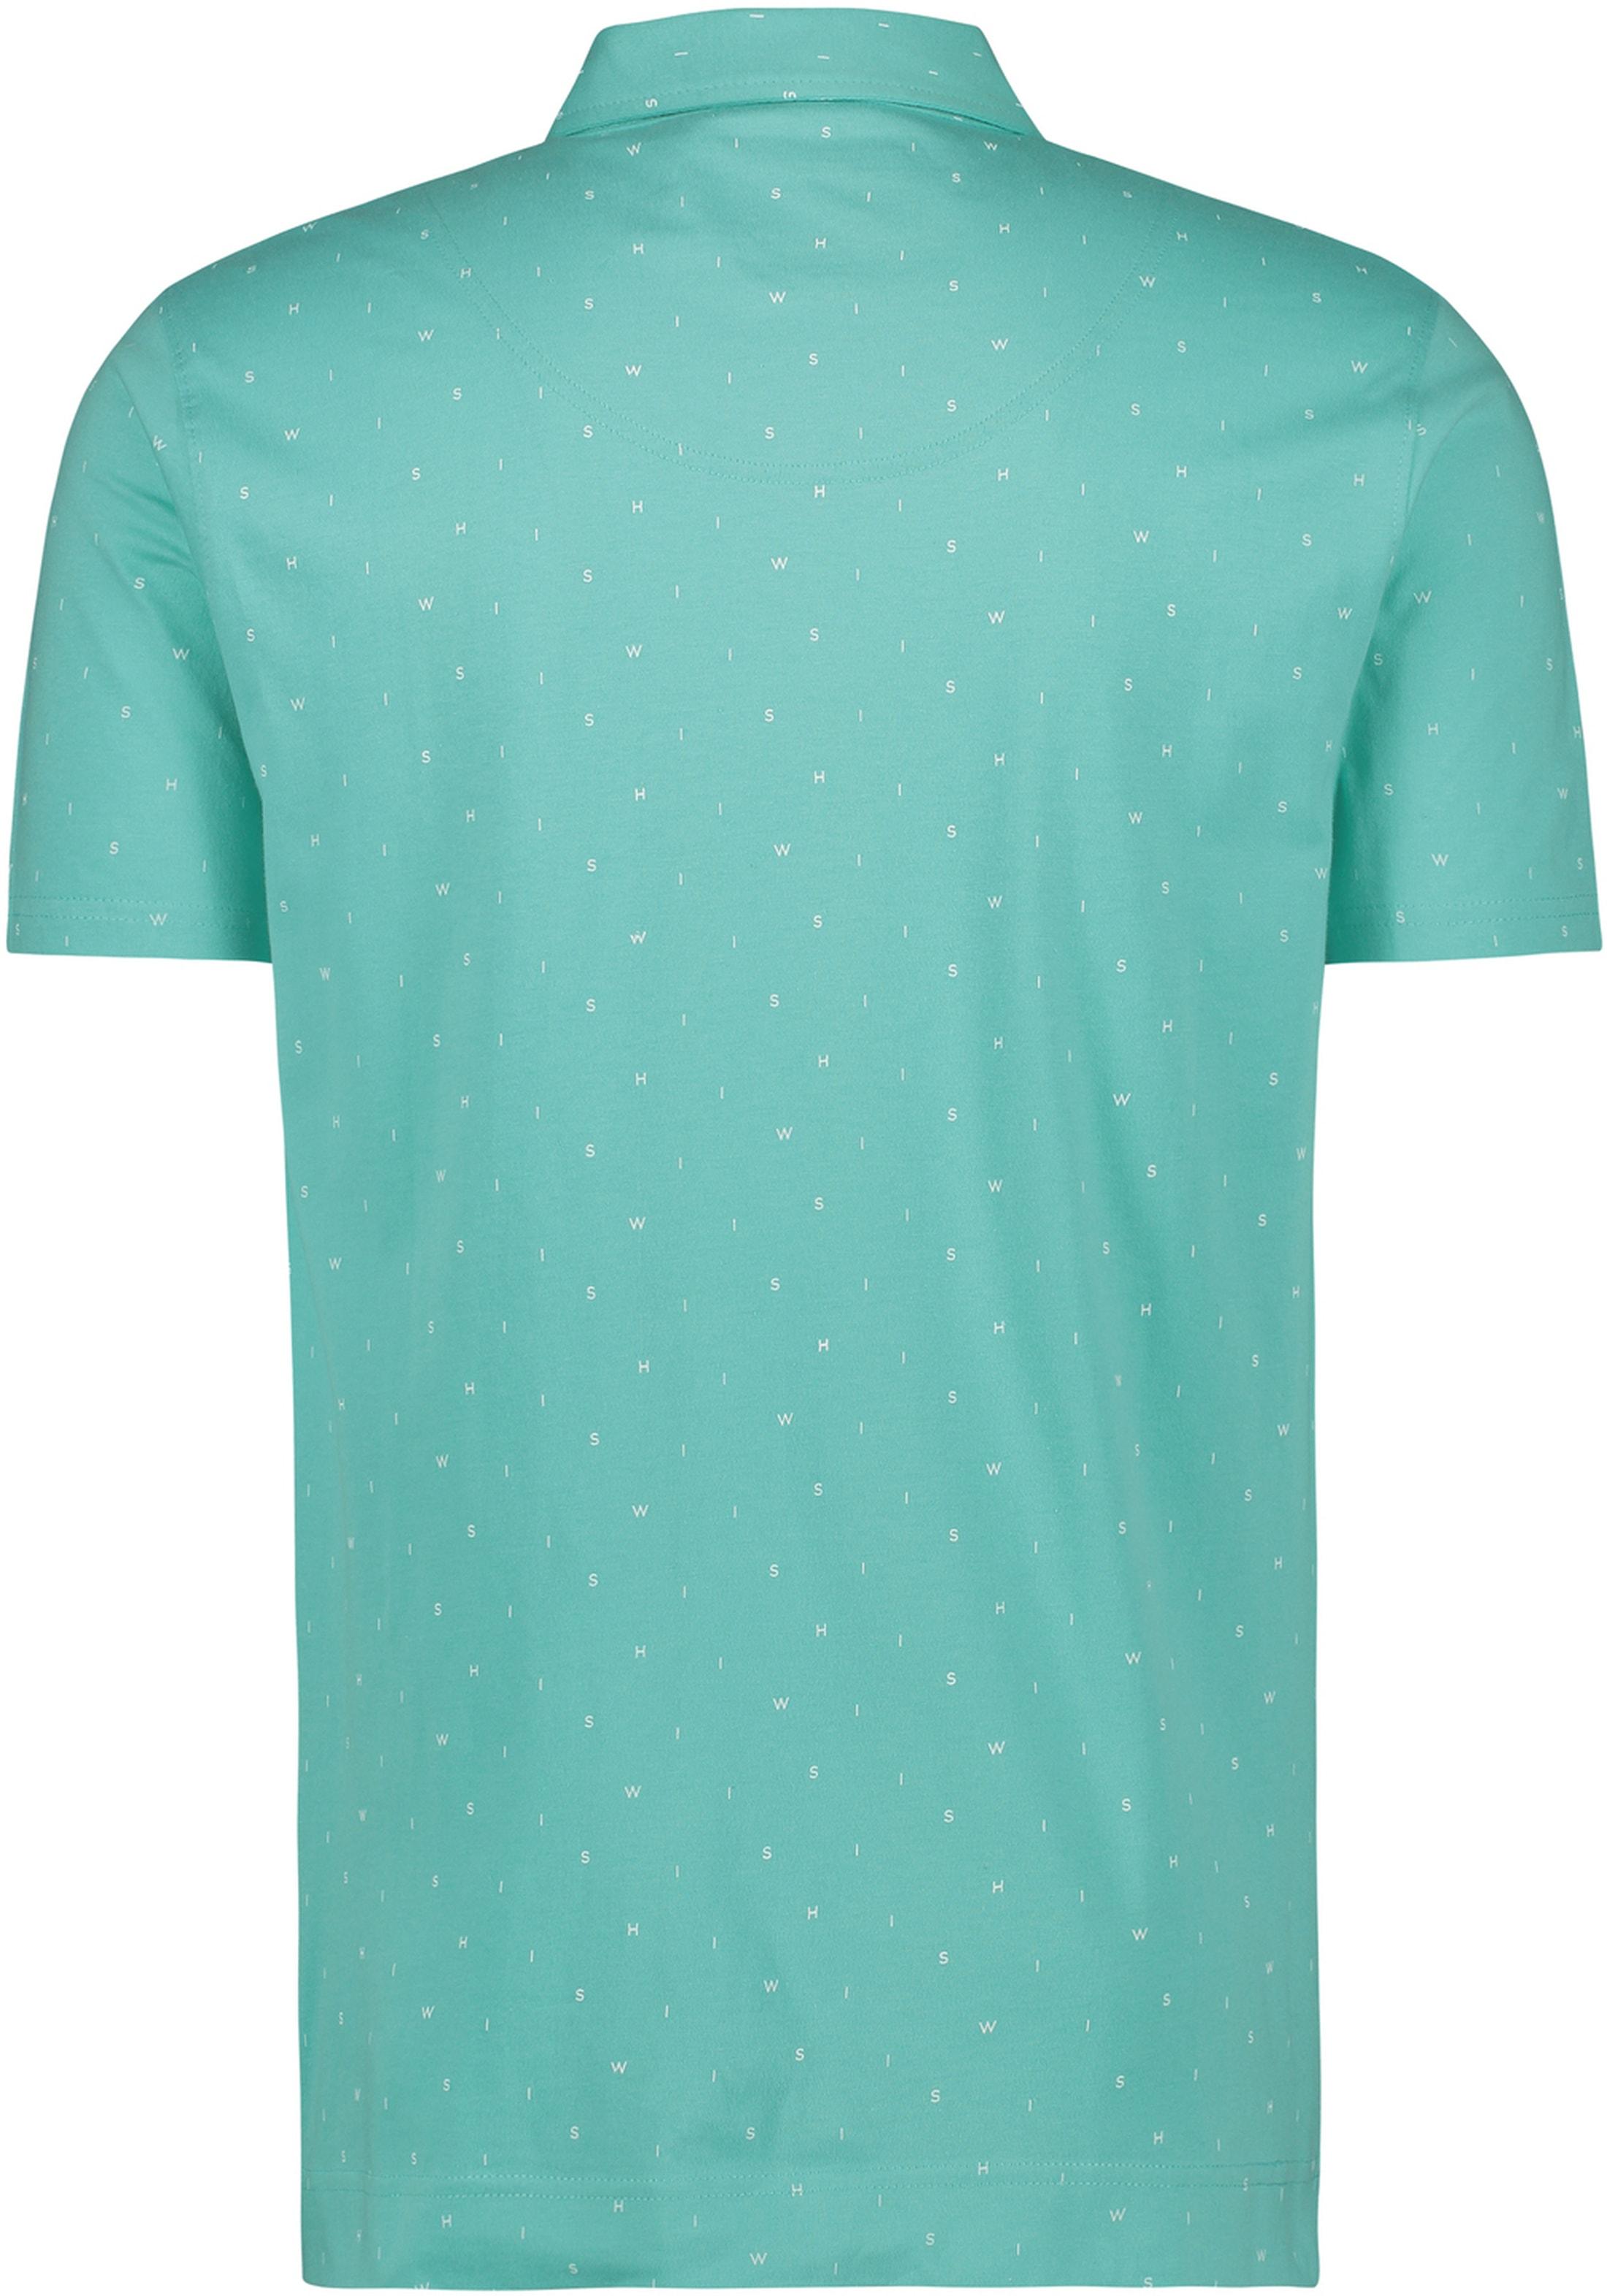 Shiwi Poloshirt Minishiwi Turquoise foto 1